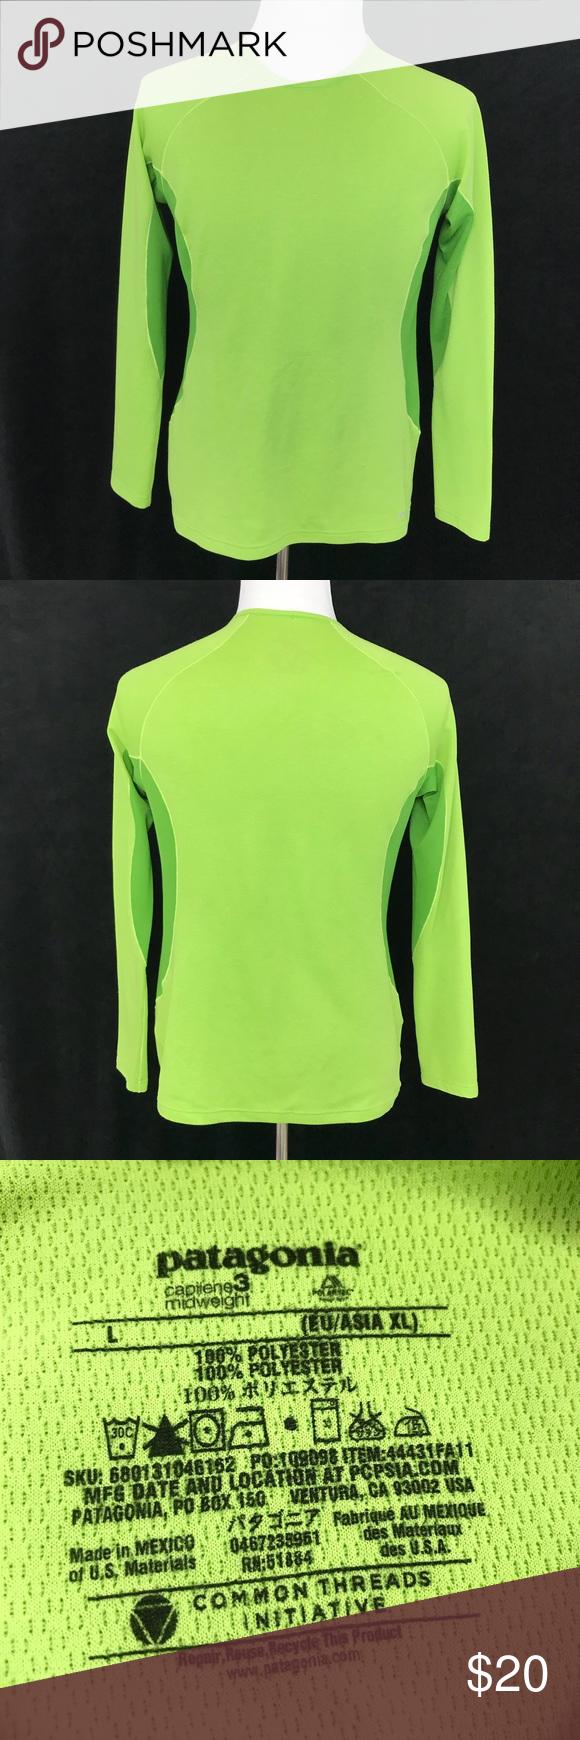 Patagonia Capilene Midweight Long Sleeve Crewneck Clothes Design Patagonia Patagonia Sweater [ 1740 x 580 Pixel ]